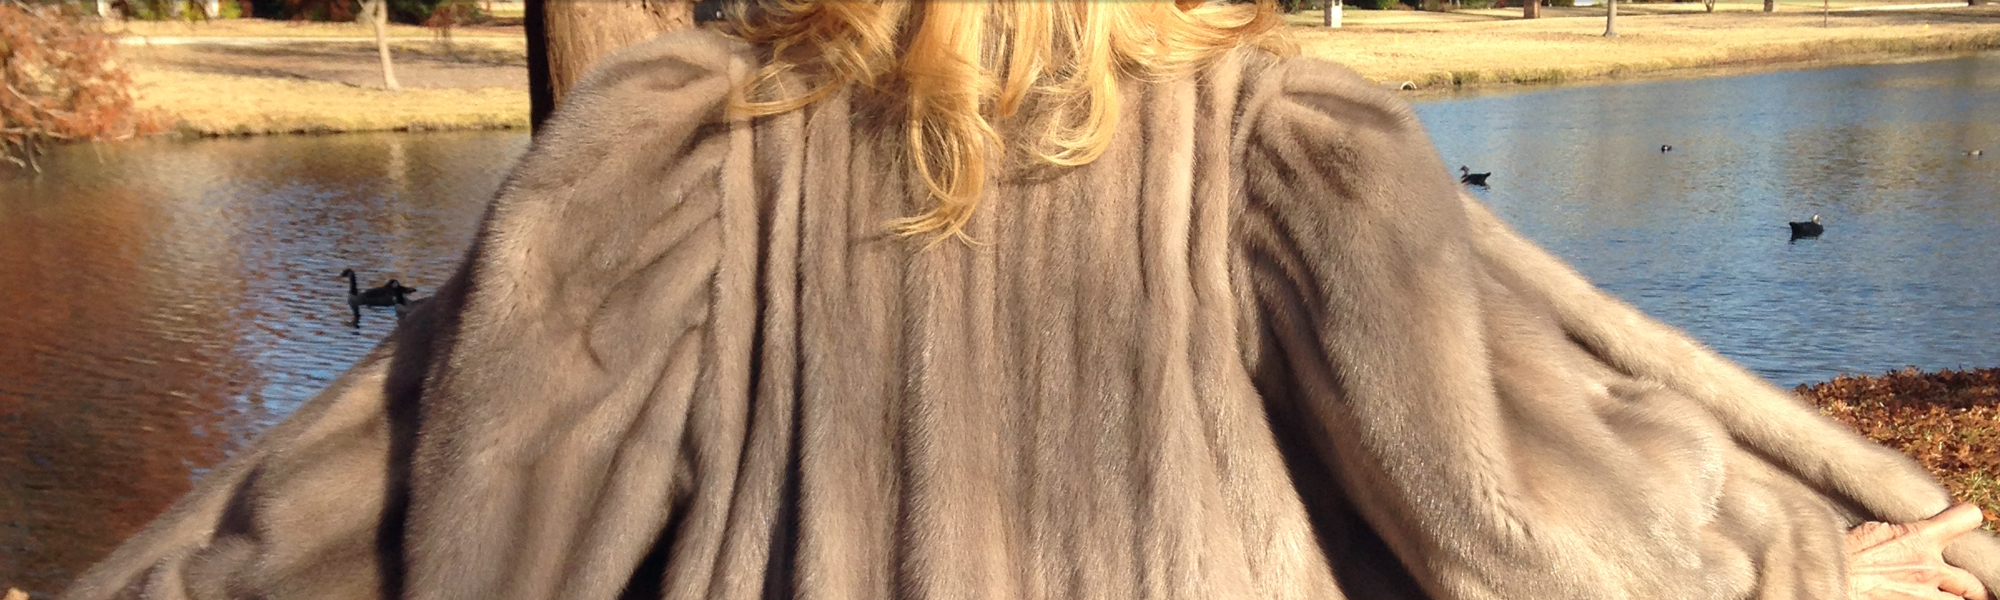 Sapphire-Colored Coat